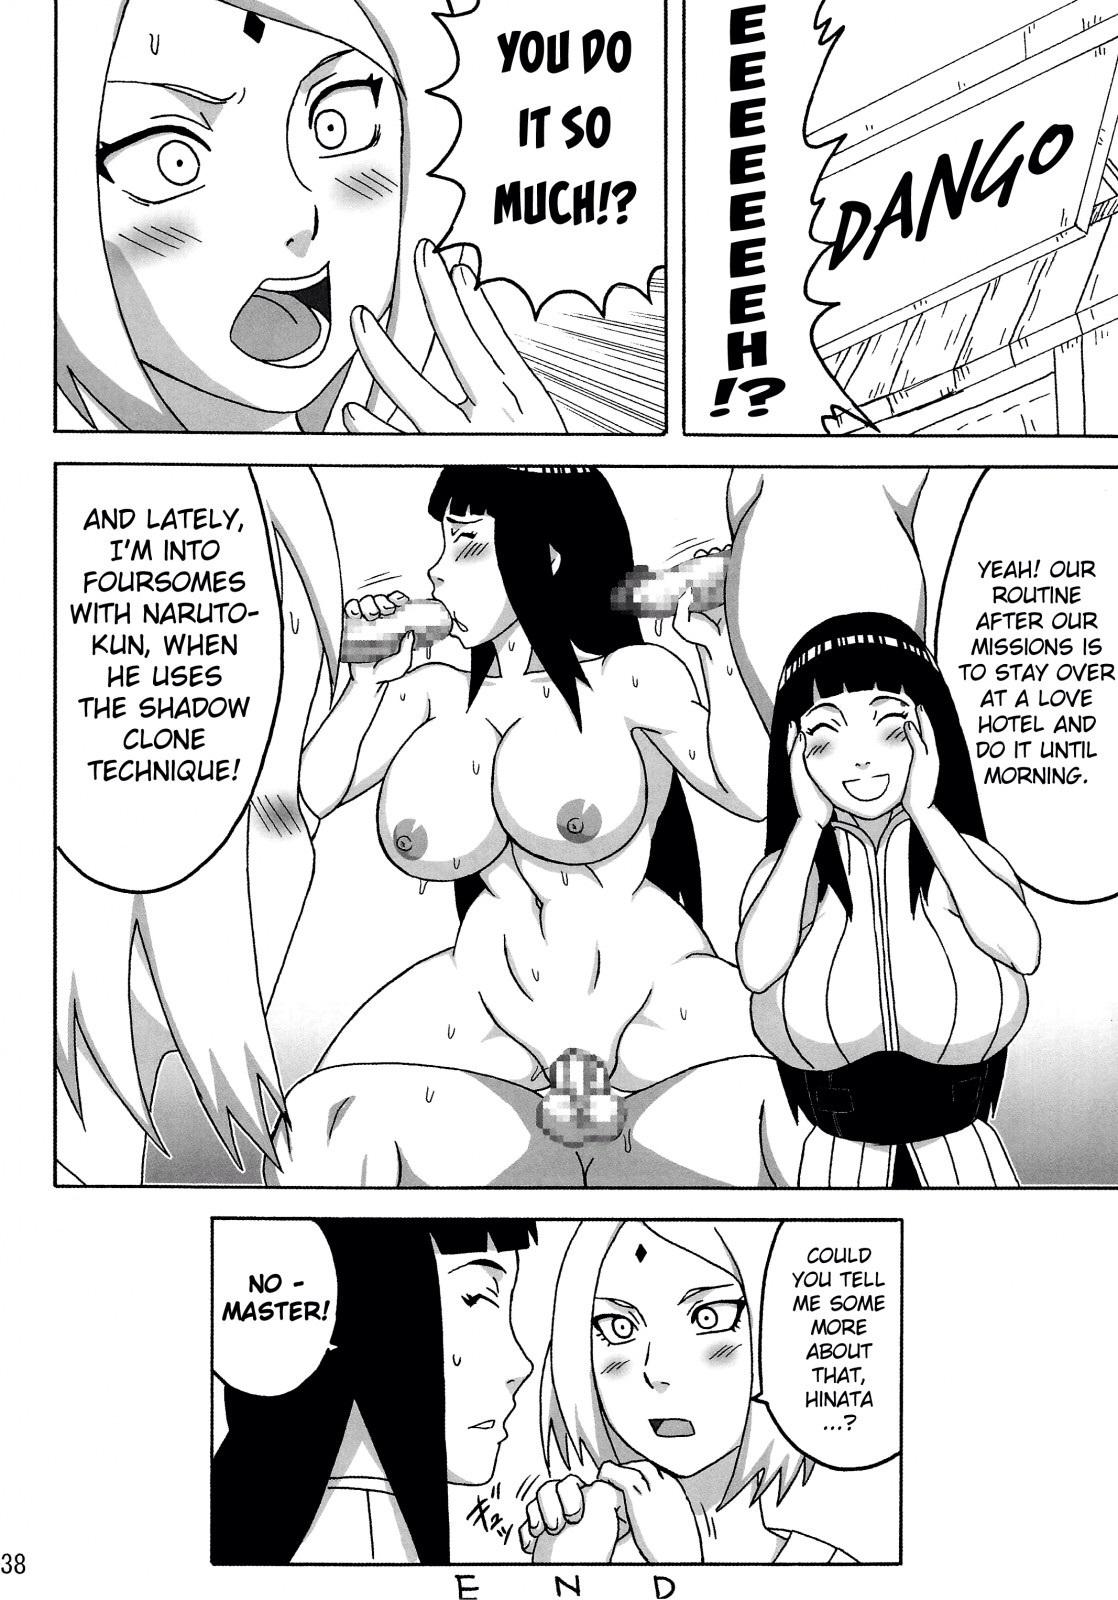 Pokemon hentai lu scio